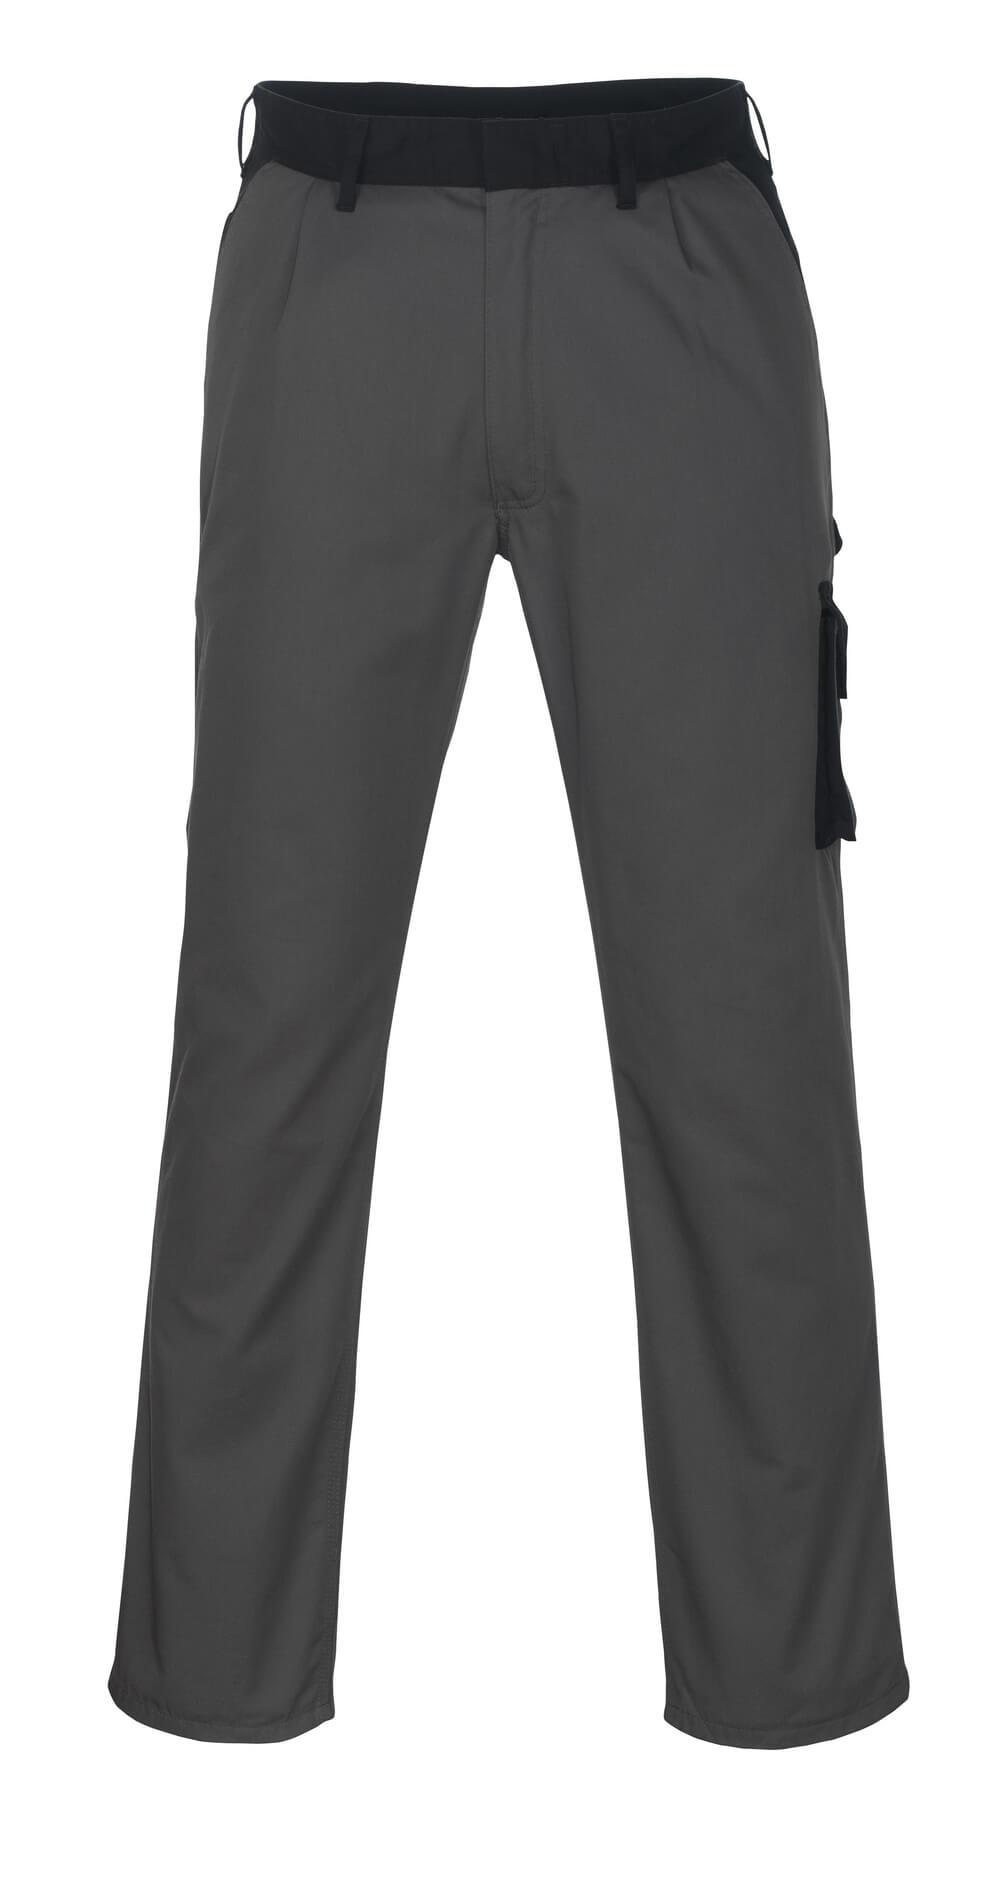 08779-442-8889 Bukser med lårlommer - antrasitt/svart